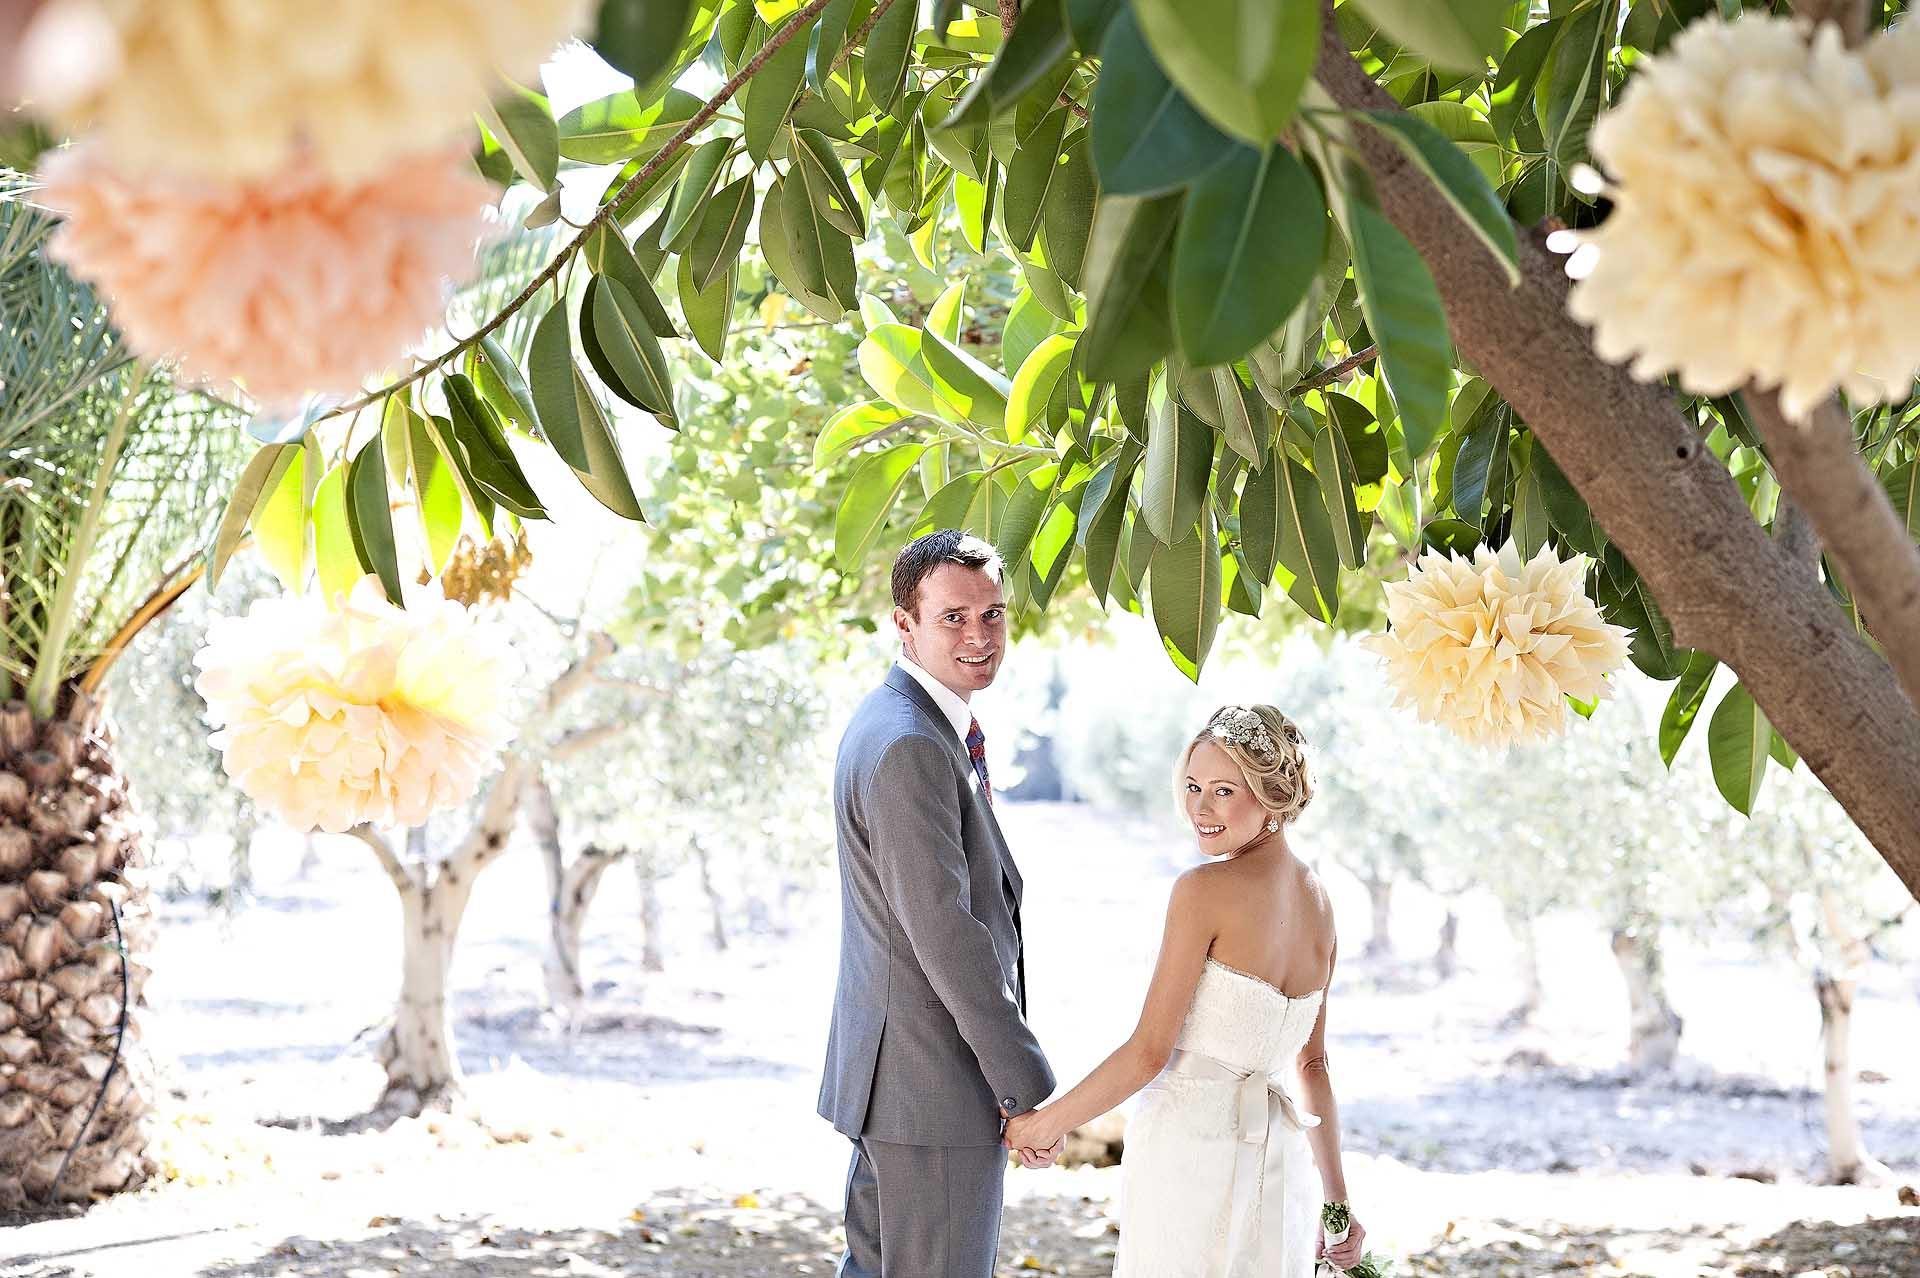 destination-wedding-001DS7_5048 copy